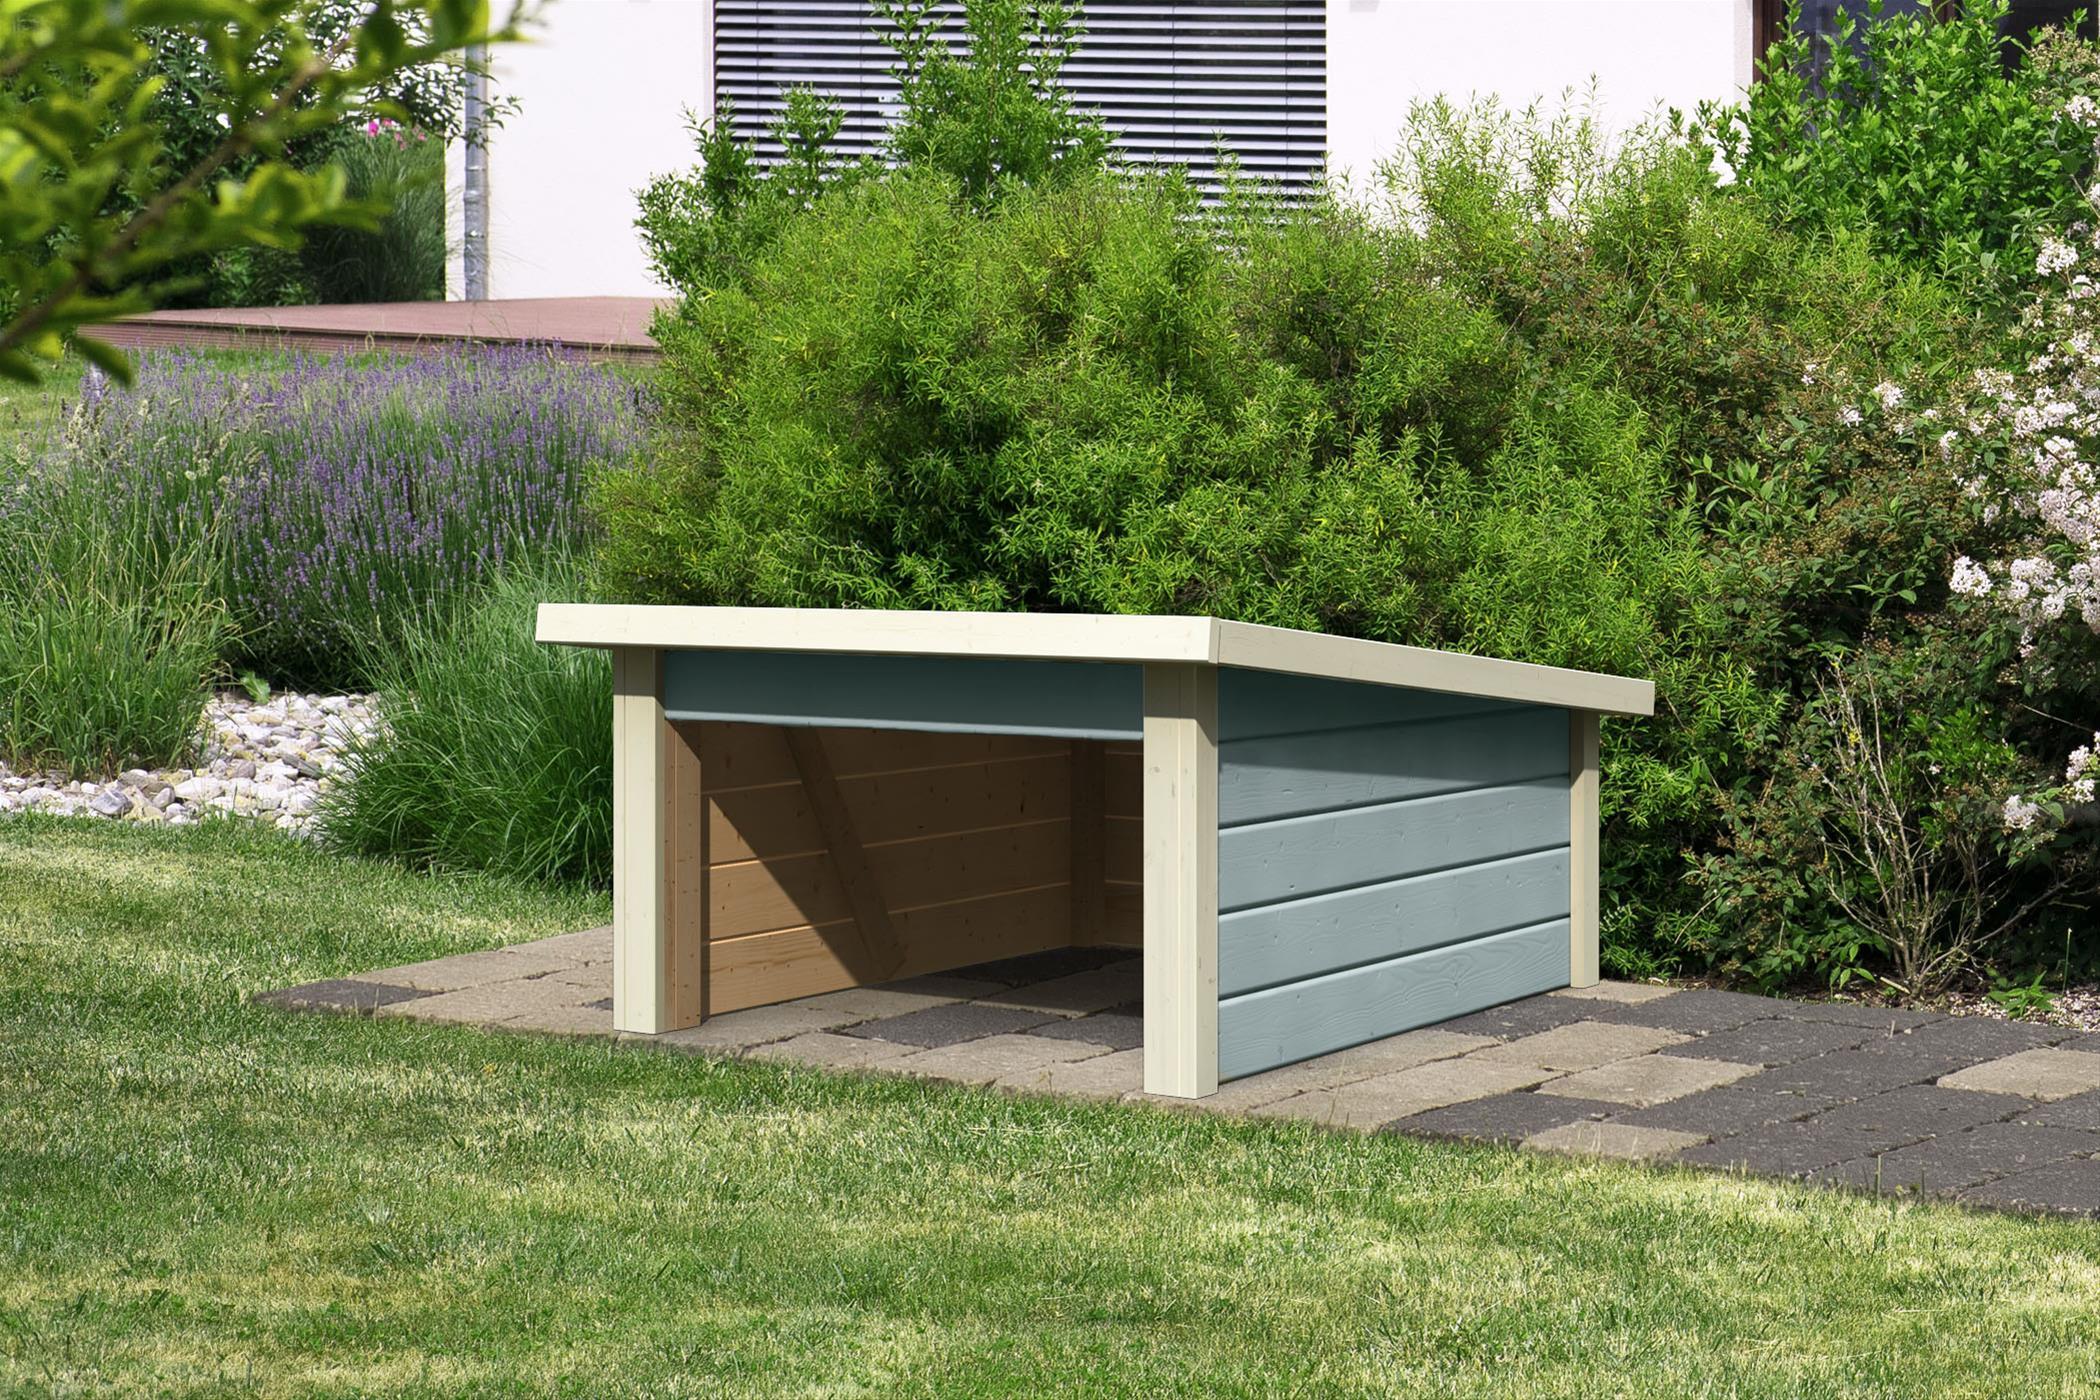 Woodfeeling Mähroboter Haus / Garage 2 seidengrau 79x96x57cm Bild 1